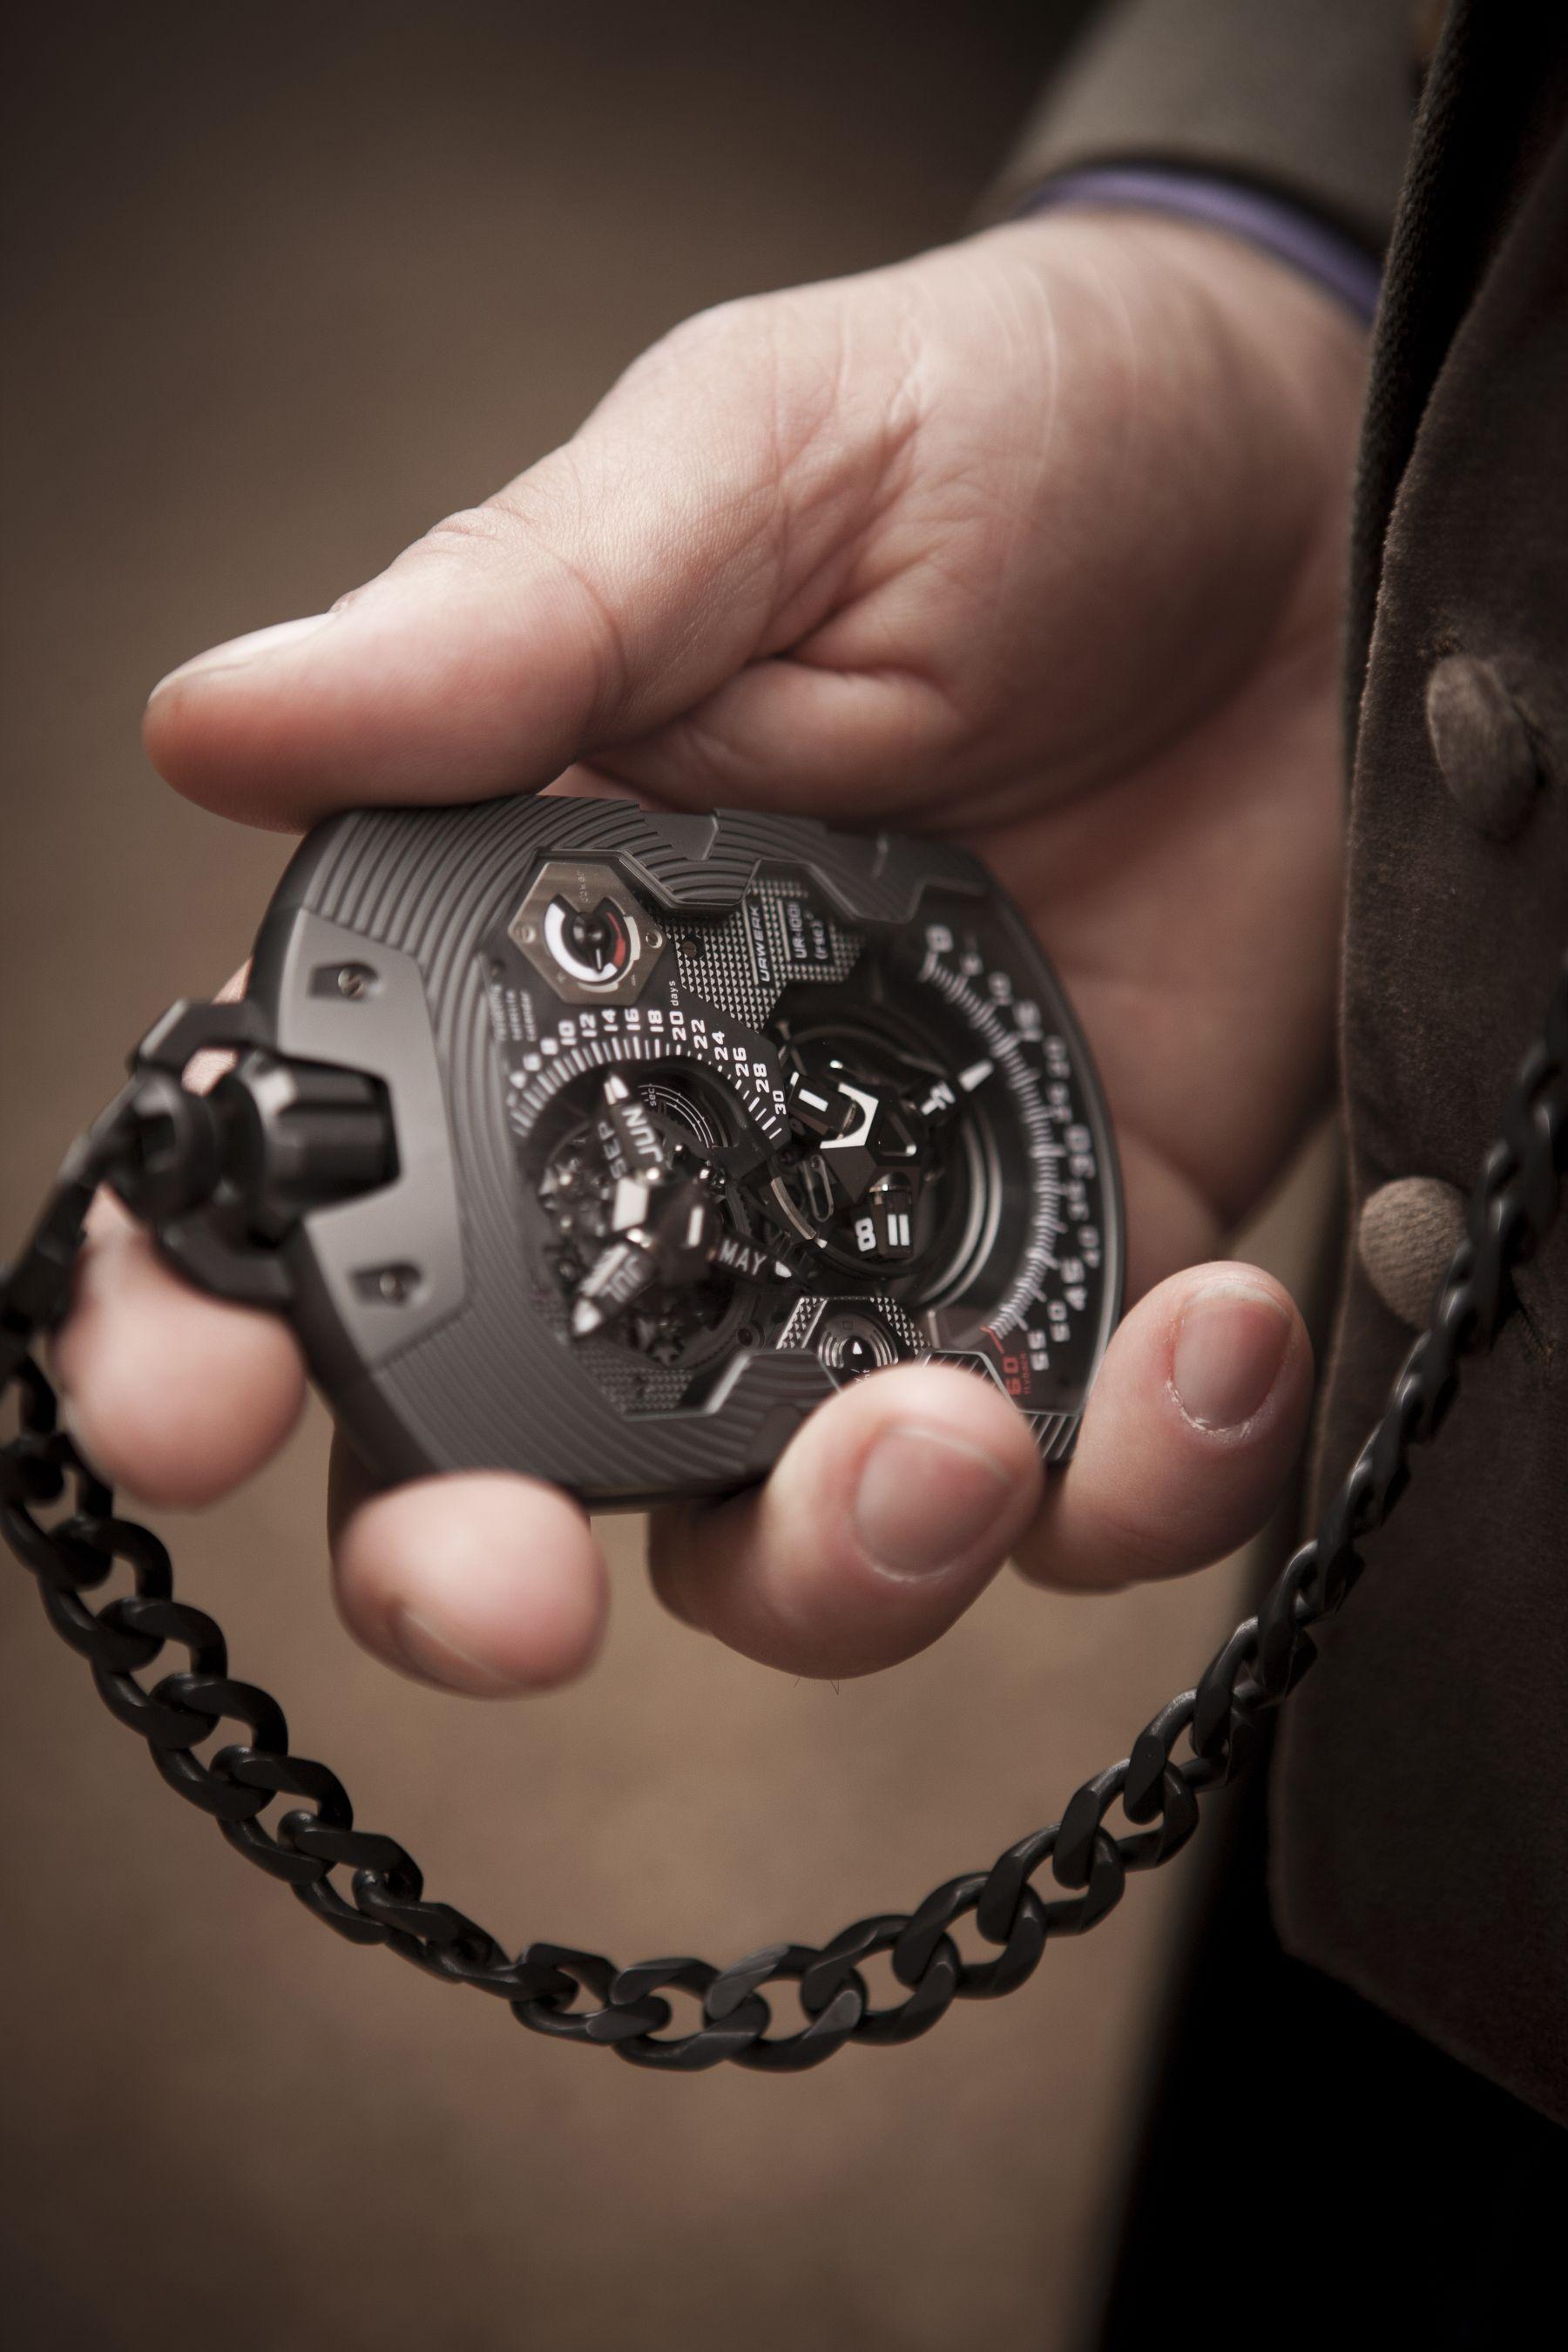 реплики на часовници breitling pеплики Качество Hublot